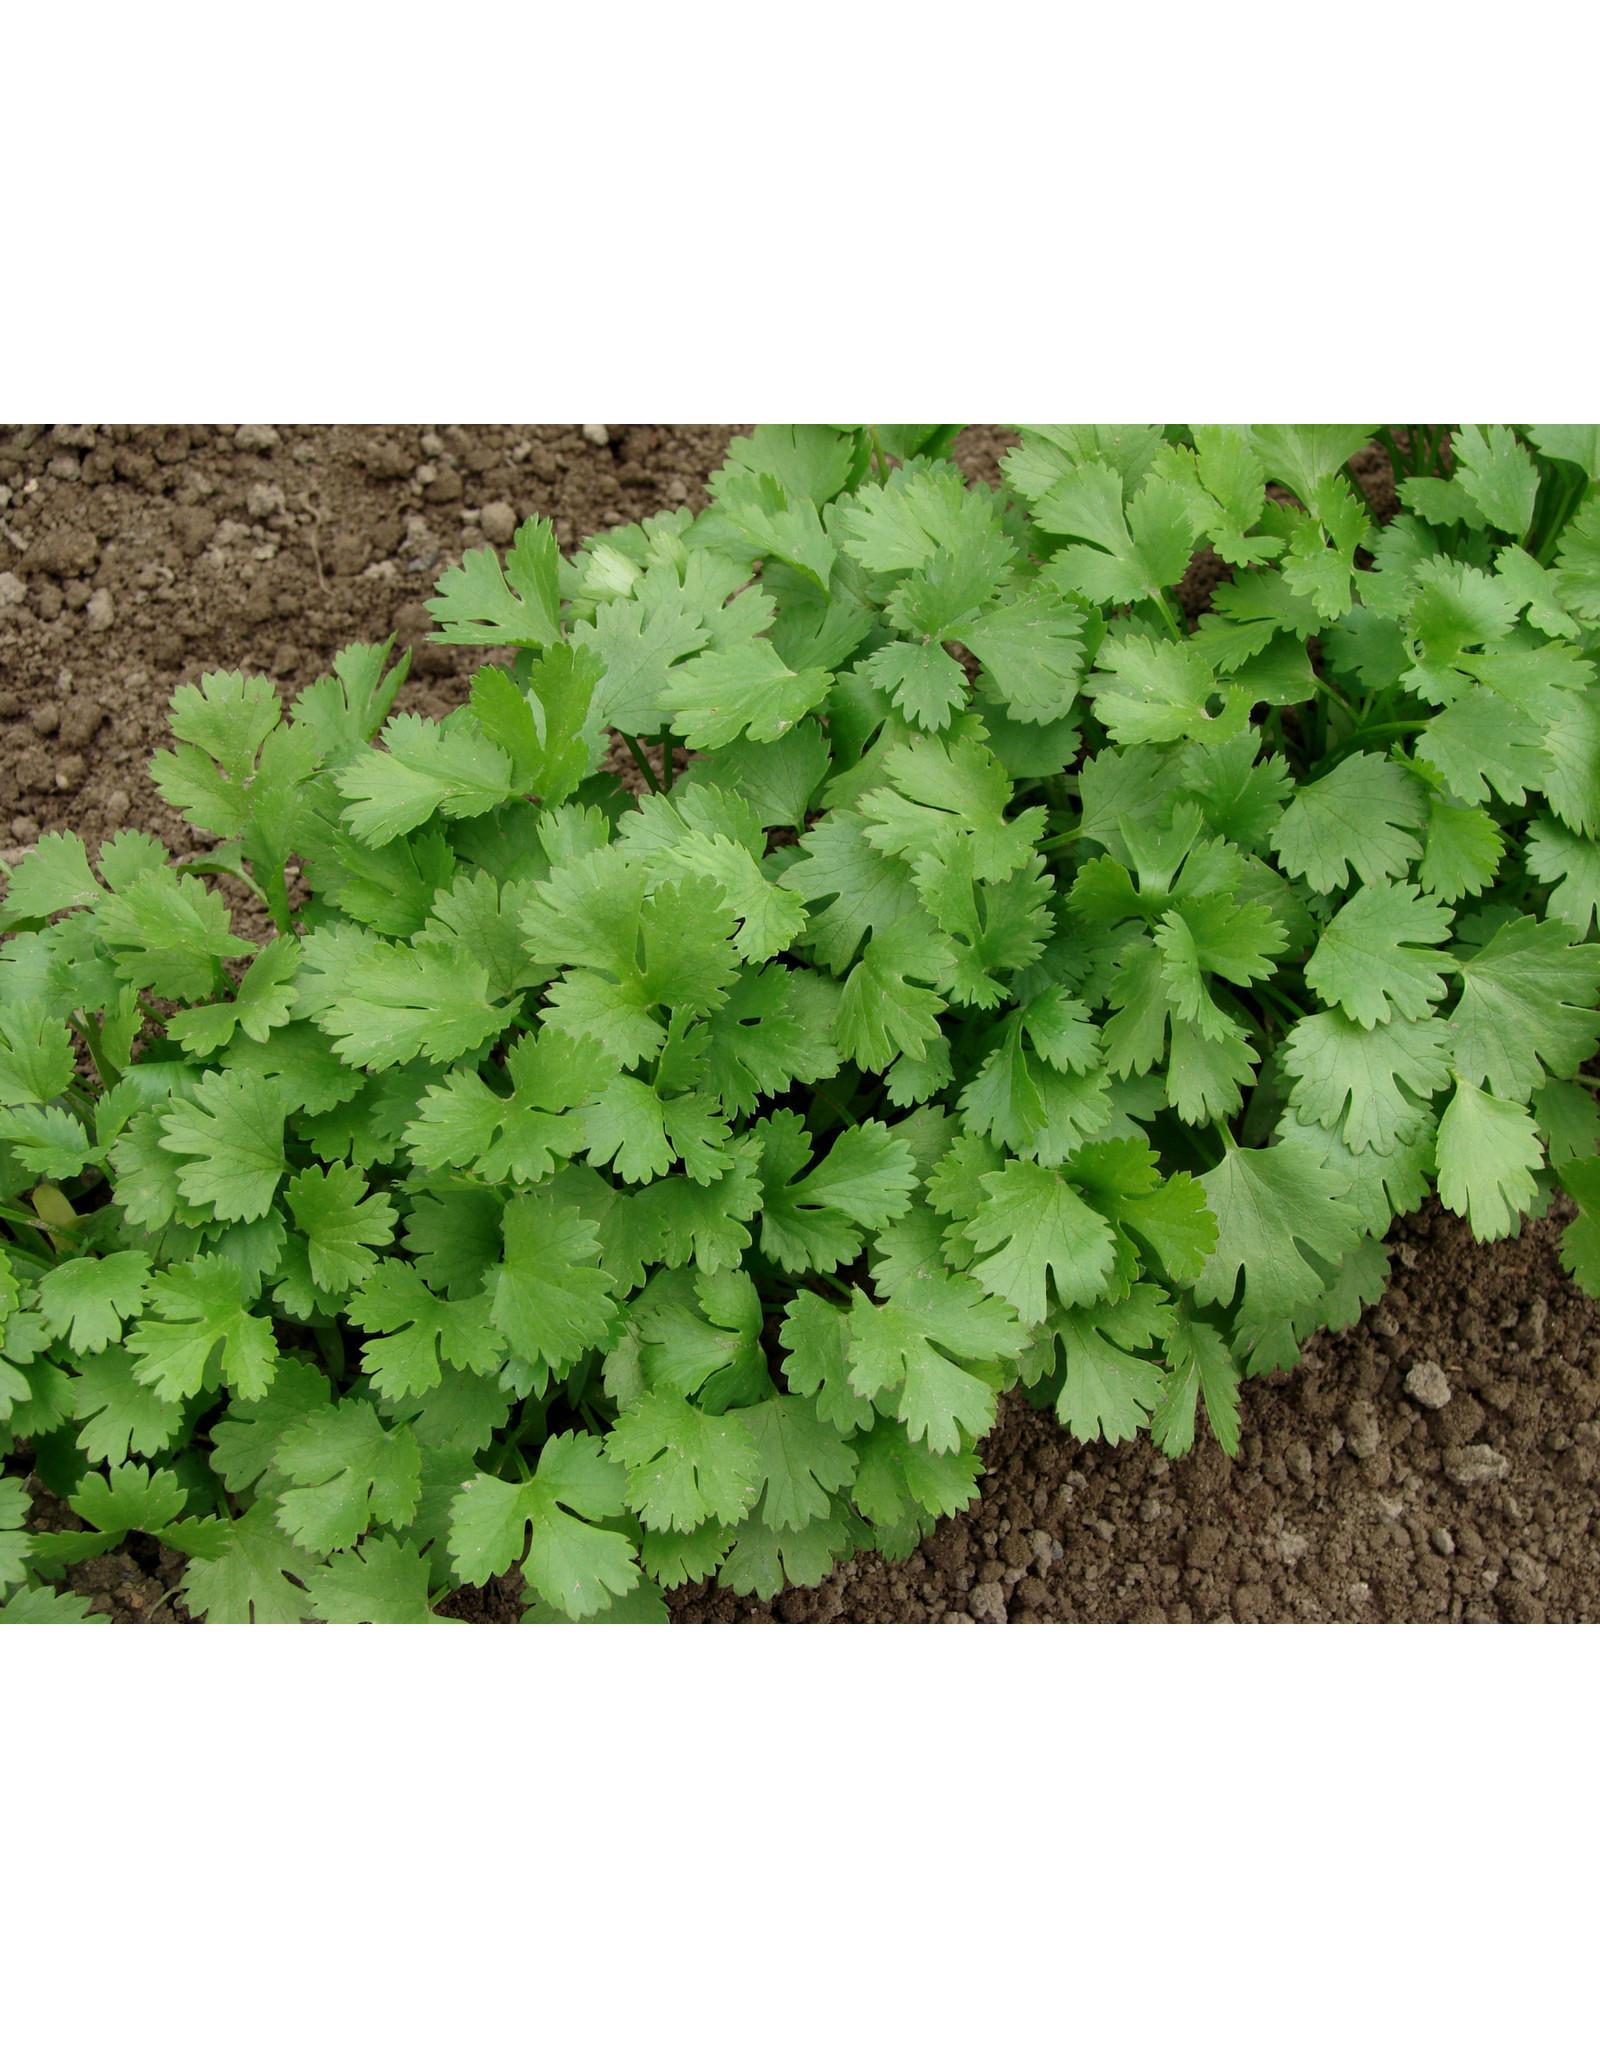 Seeds - Cilantro / Coriander Org